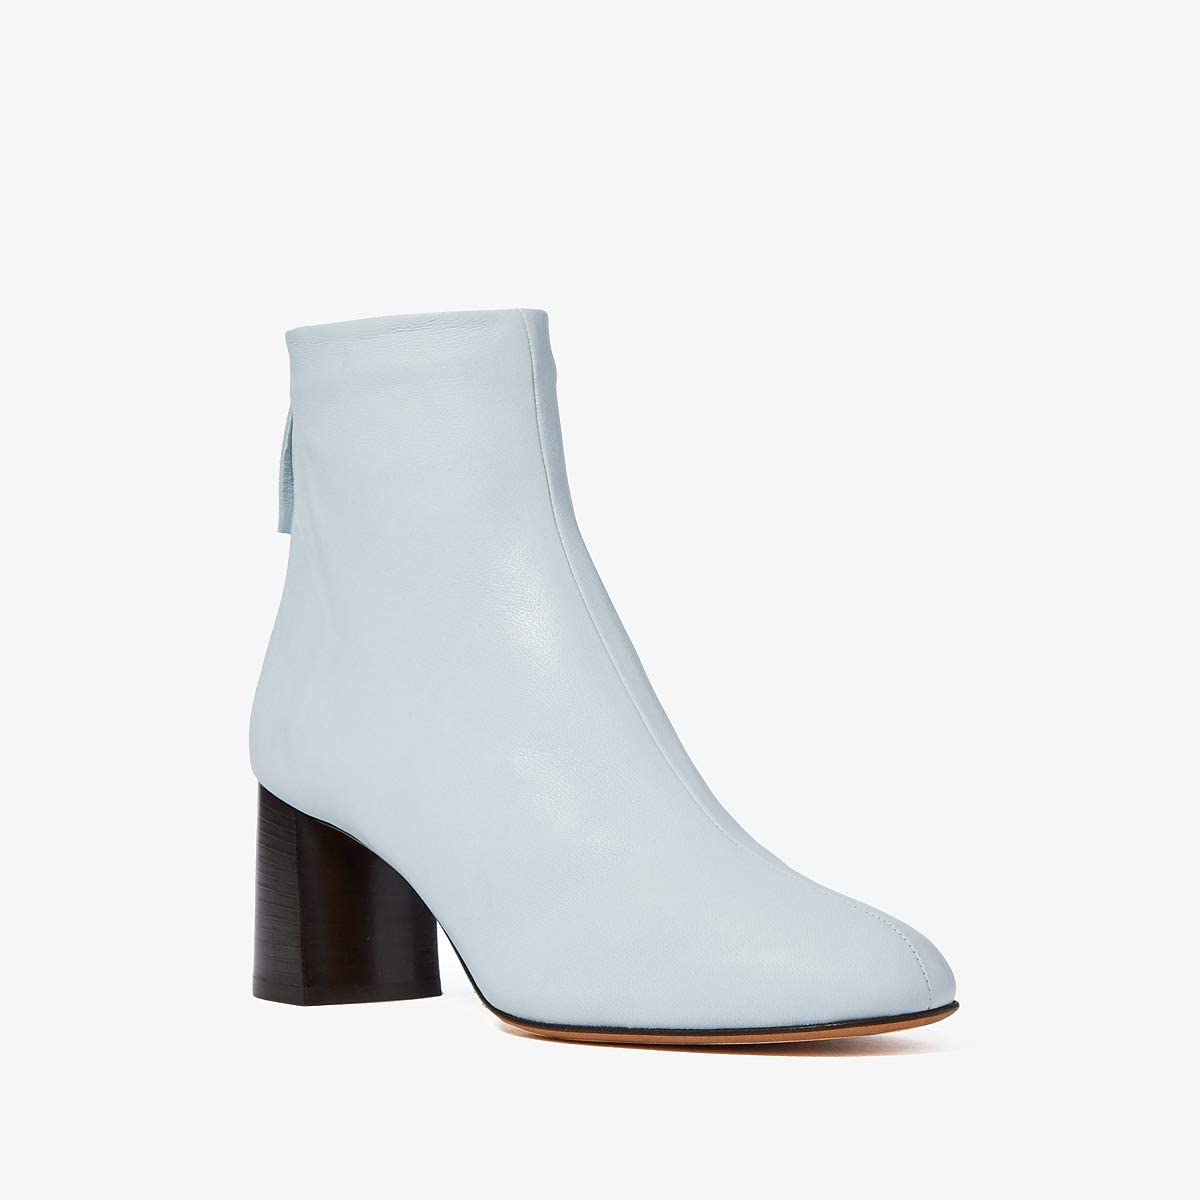 3.1 Phillip Lim Nadia Soft Heel Boot | Women's shoes | 2020 Newest